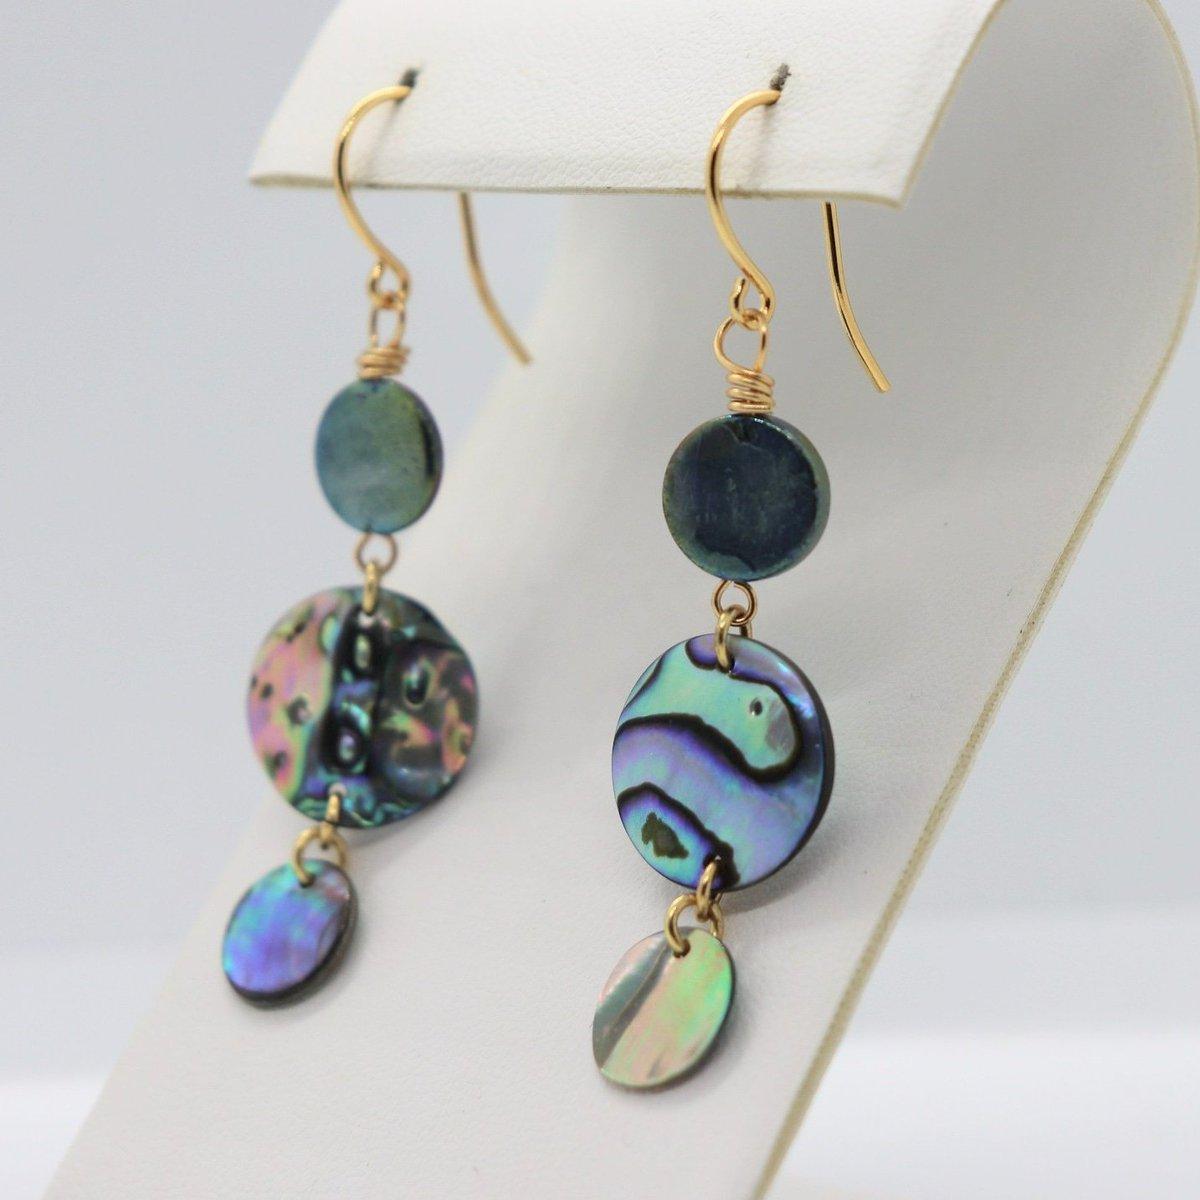 Boho Style Teardrop Earrings Beach Boho Style Hoop Earrings jasper stones and silver semi precious jasper beads,Boho Dangle Earrings